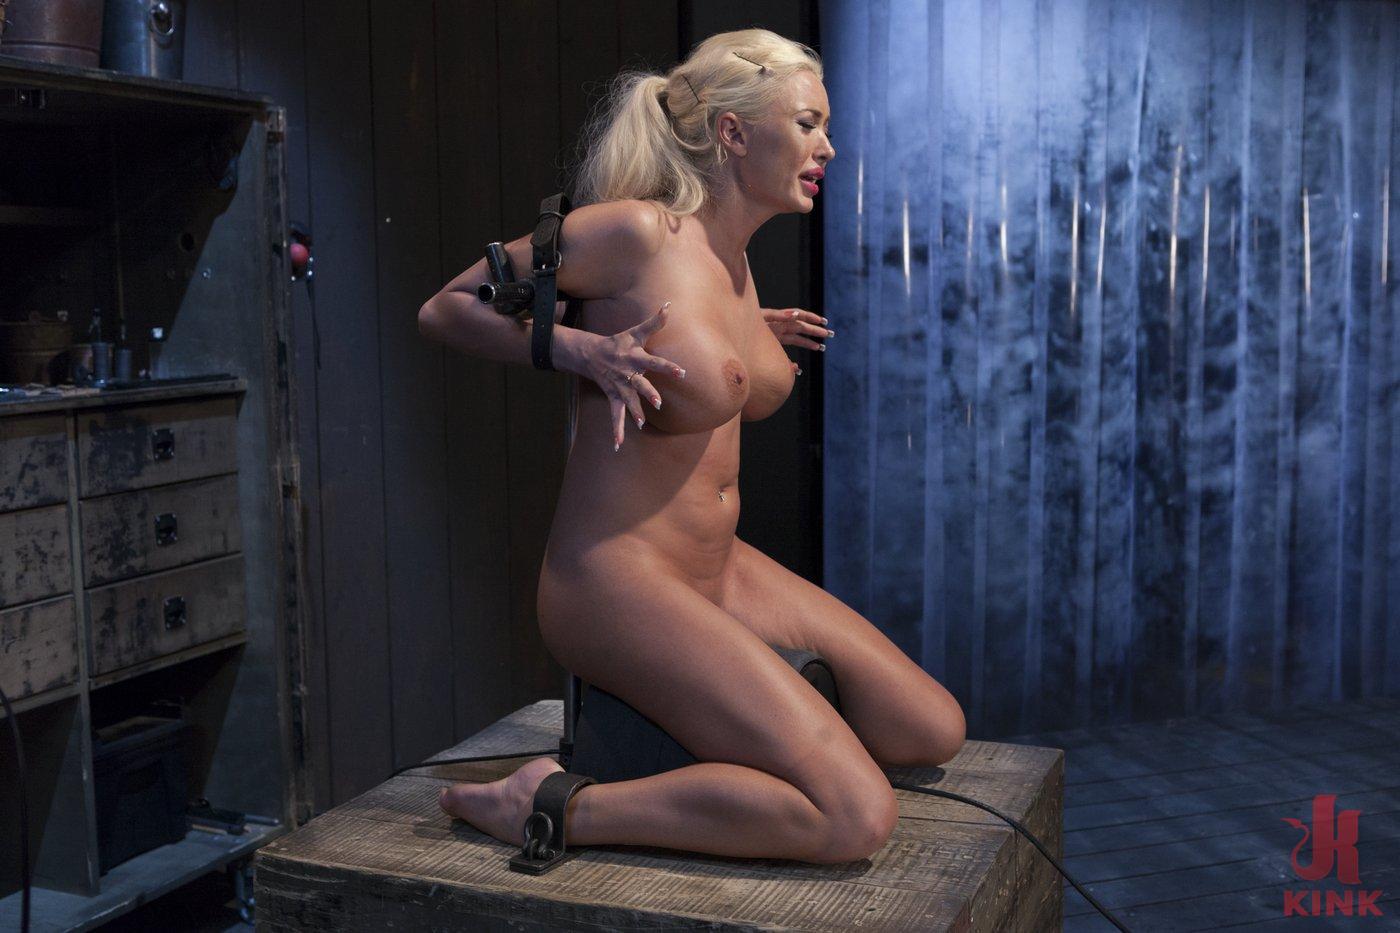 Photo number 5 from Summer Brielle - Broken Porn Star shot for Device Bondage on Kink.com. Featuring Summer Brielle in hardcore BDSM & Fetish porn.